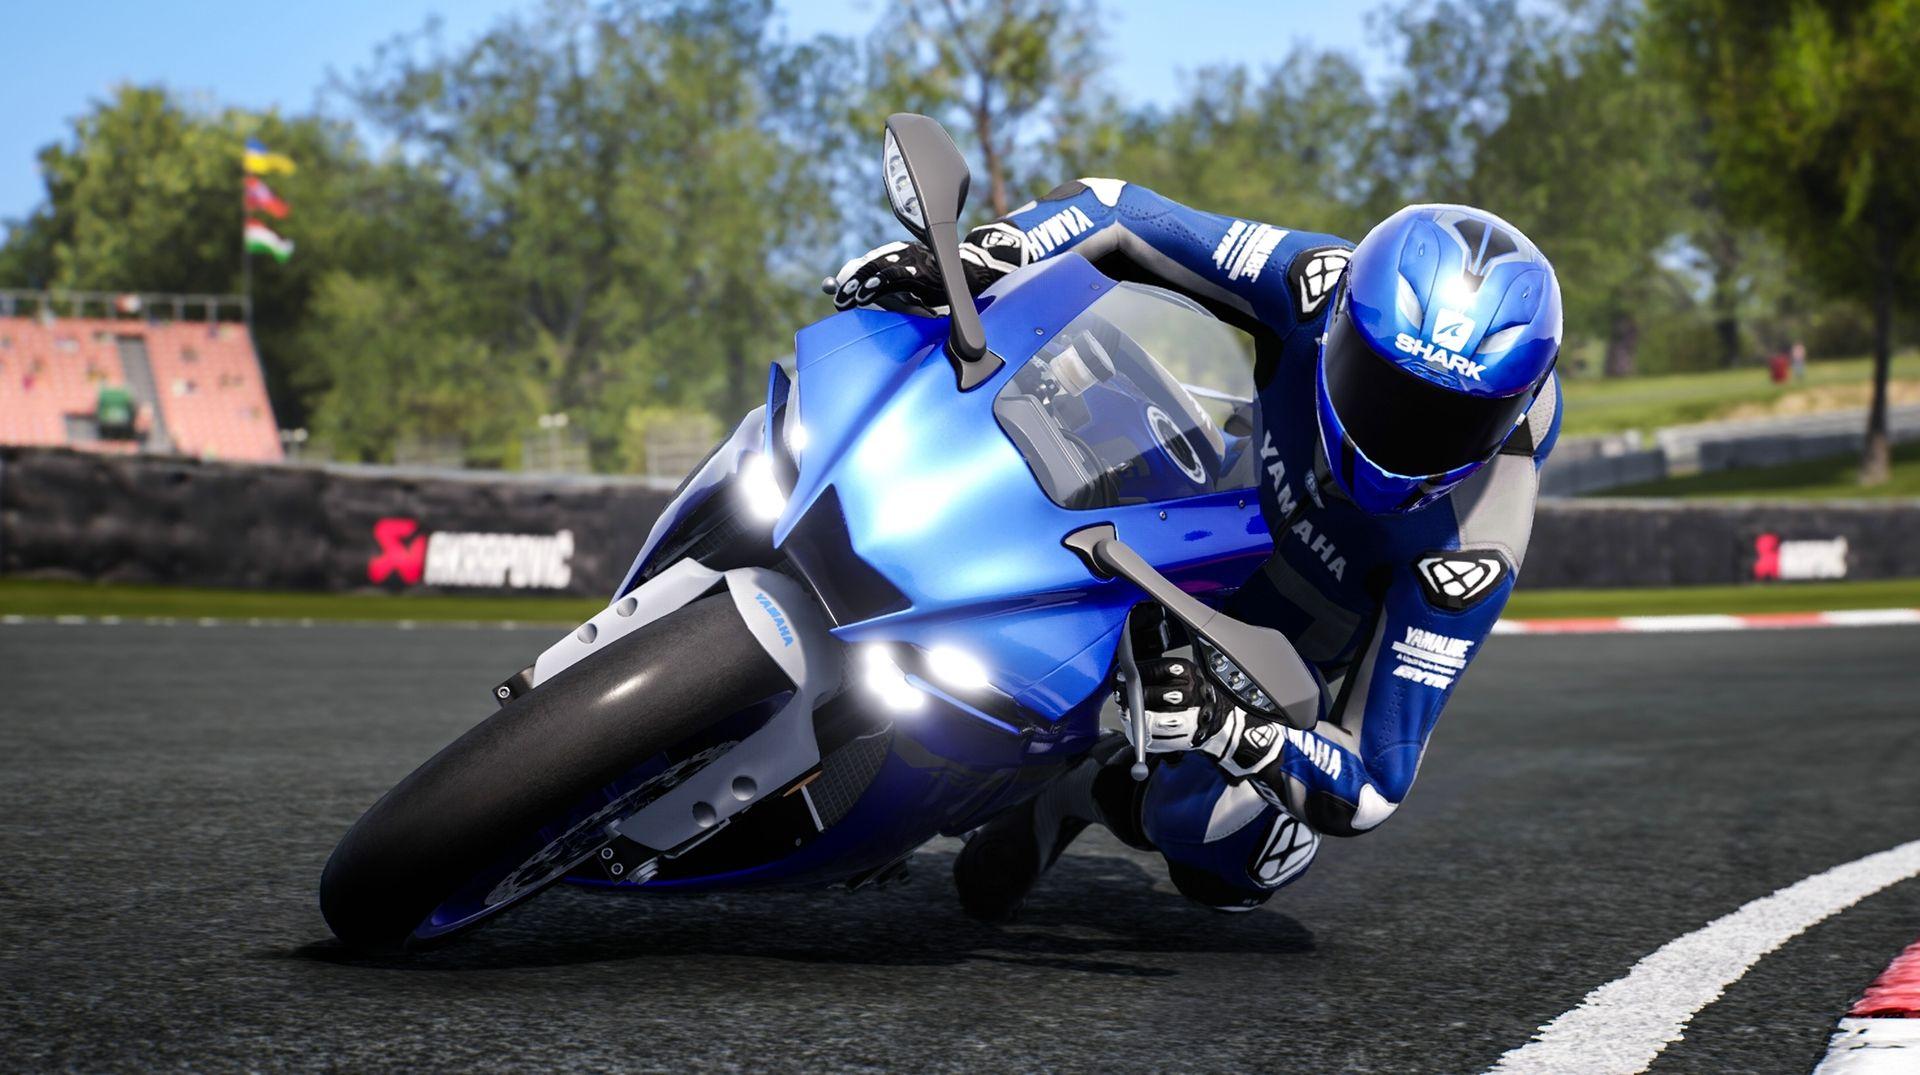 ride 4 - race- generacion xbox